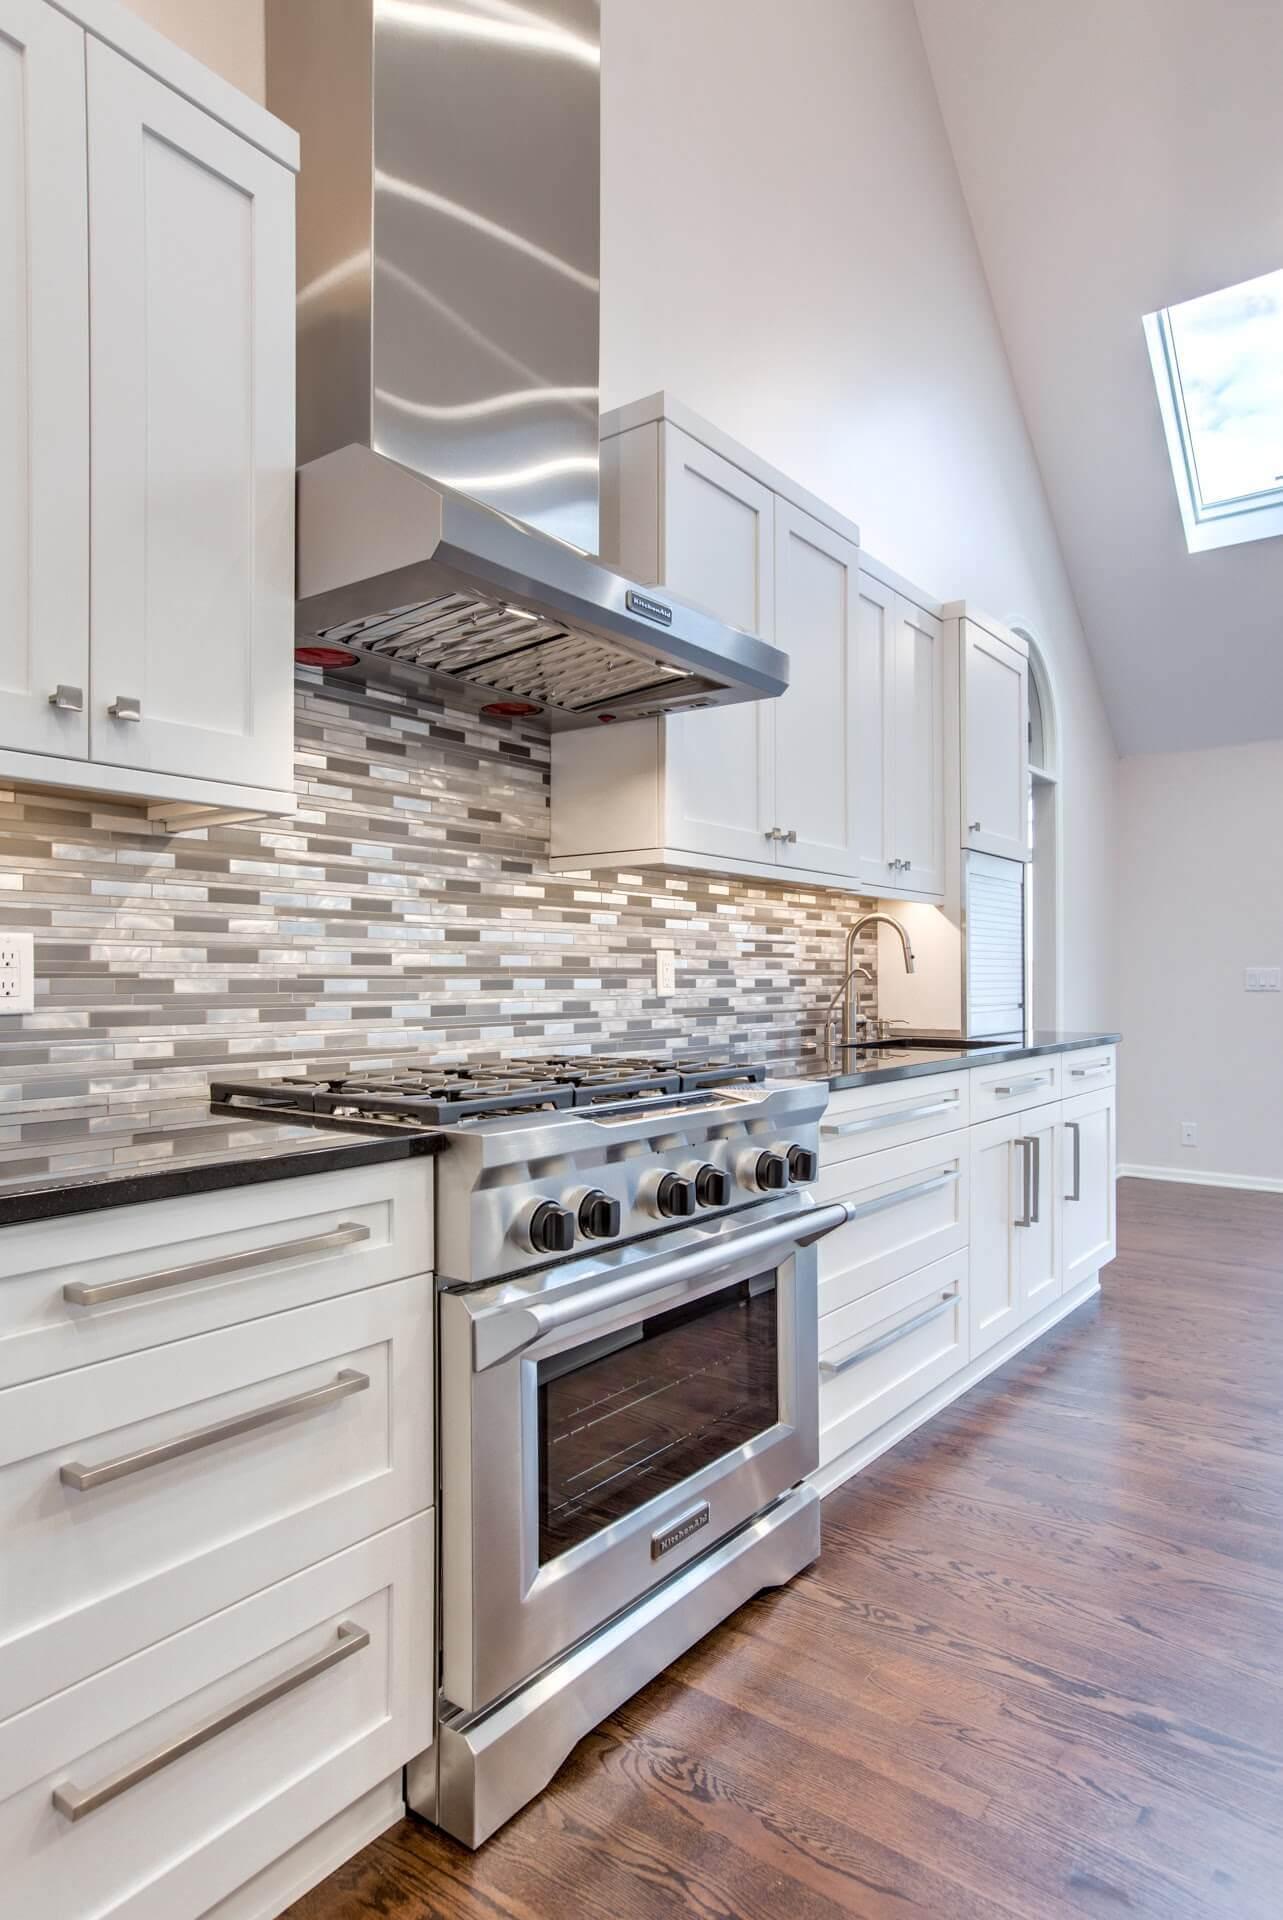 old dominion remodel kitchen remodeling lincoln ne custom renovations custom kitchen renovations Lincoln NE